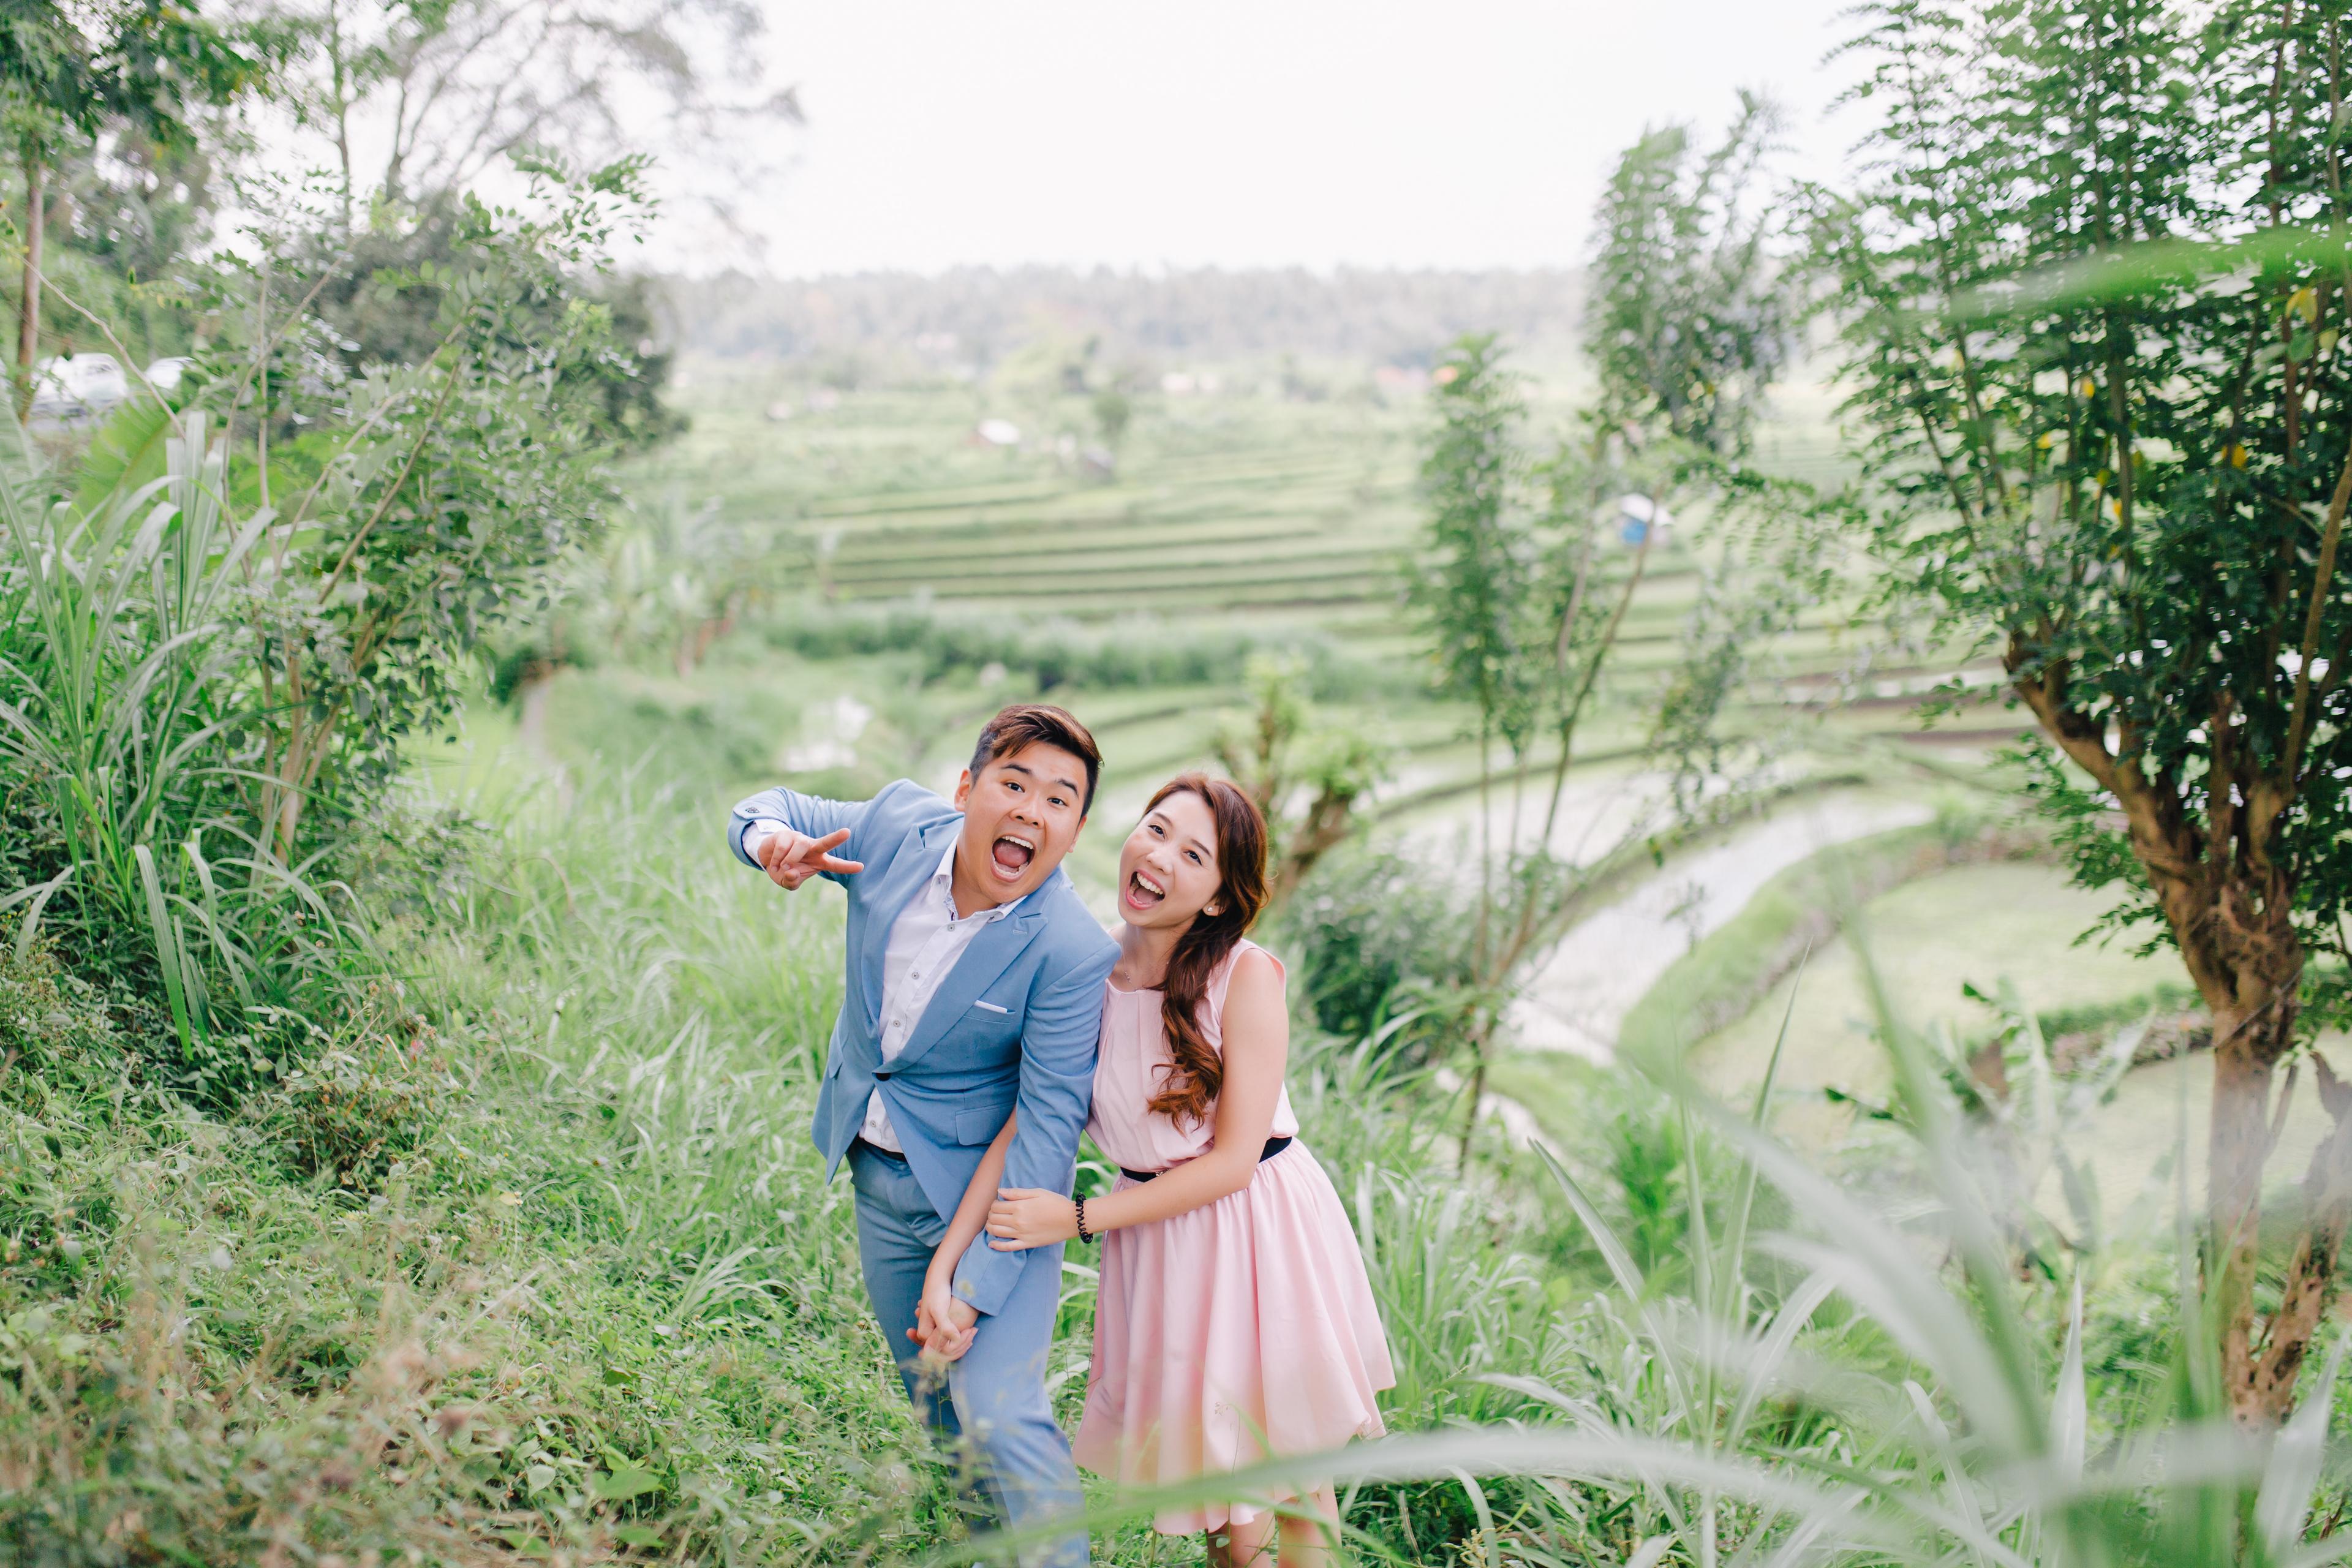 Bali Pre Wedding Photo Shoot in Bali Denpasar, Indonesia